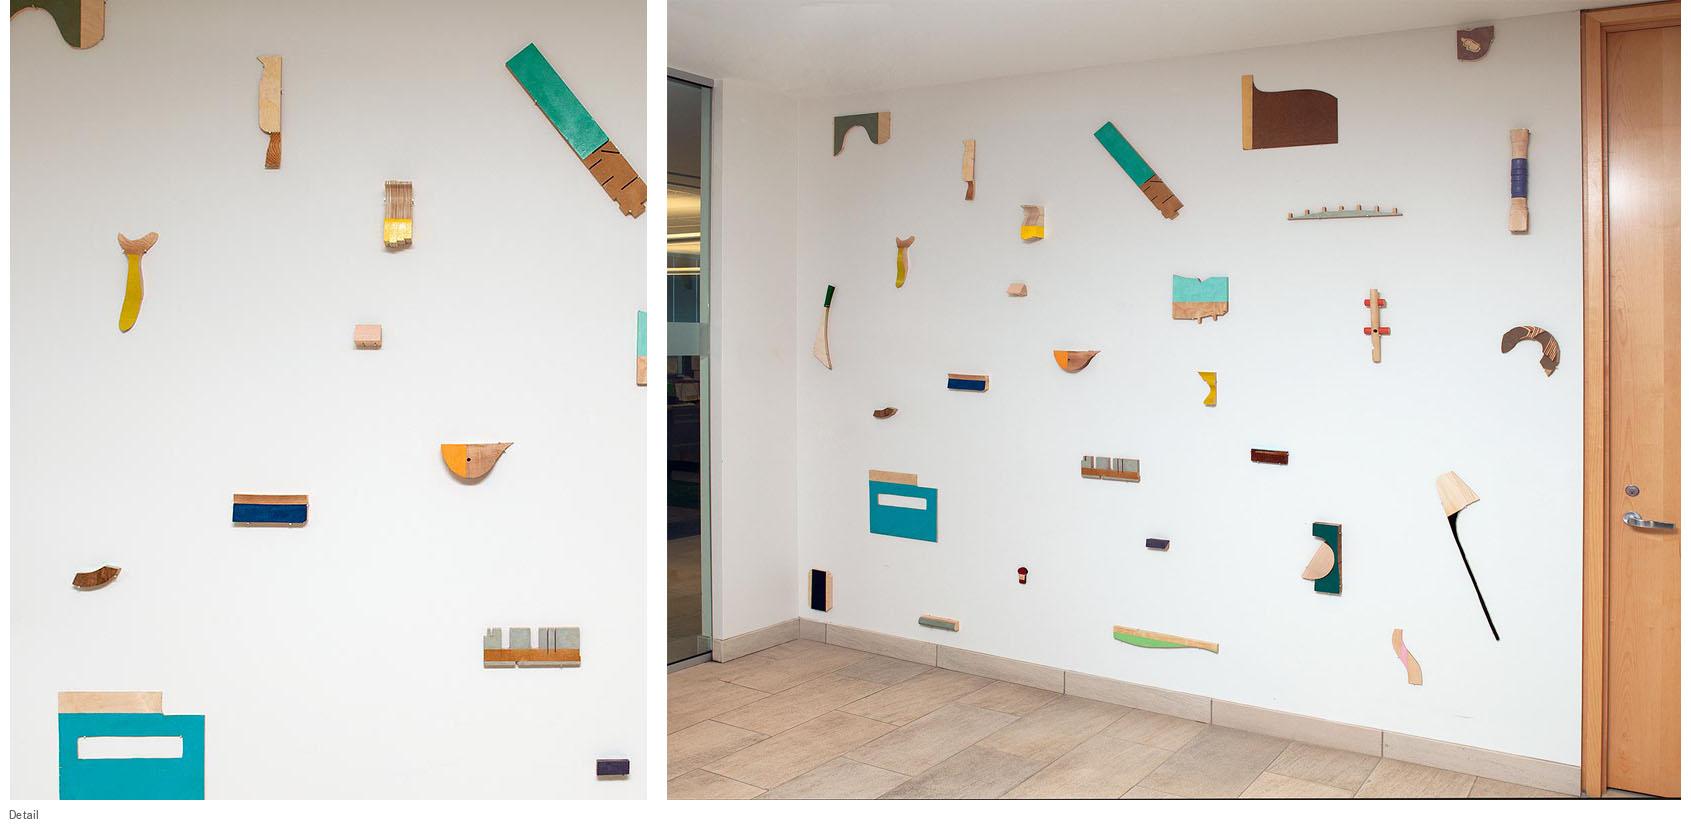 Paulina Wiszowata - Art Objects (Ma Babies) batch 3